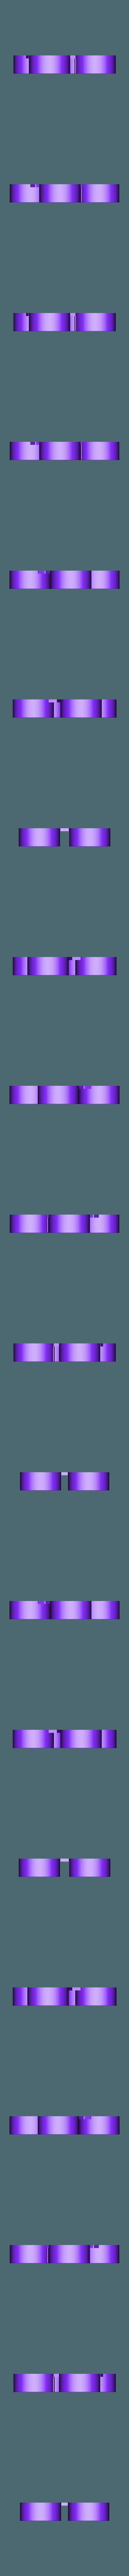 franck_fan_duct.stl Download free STL file Quad fan ducted • 3D printer model, touchthebitum